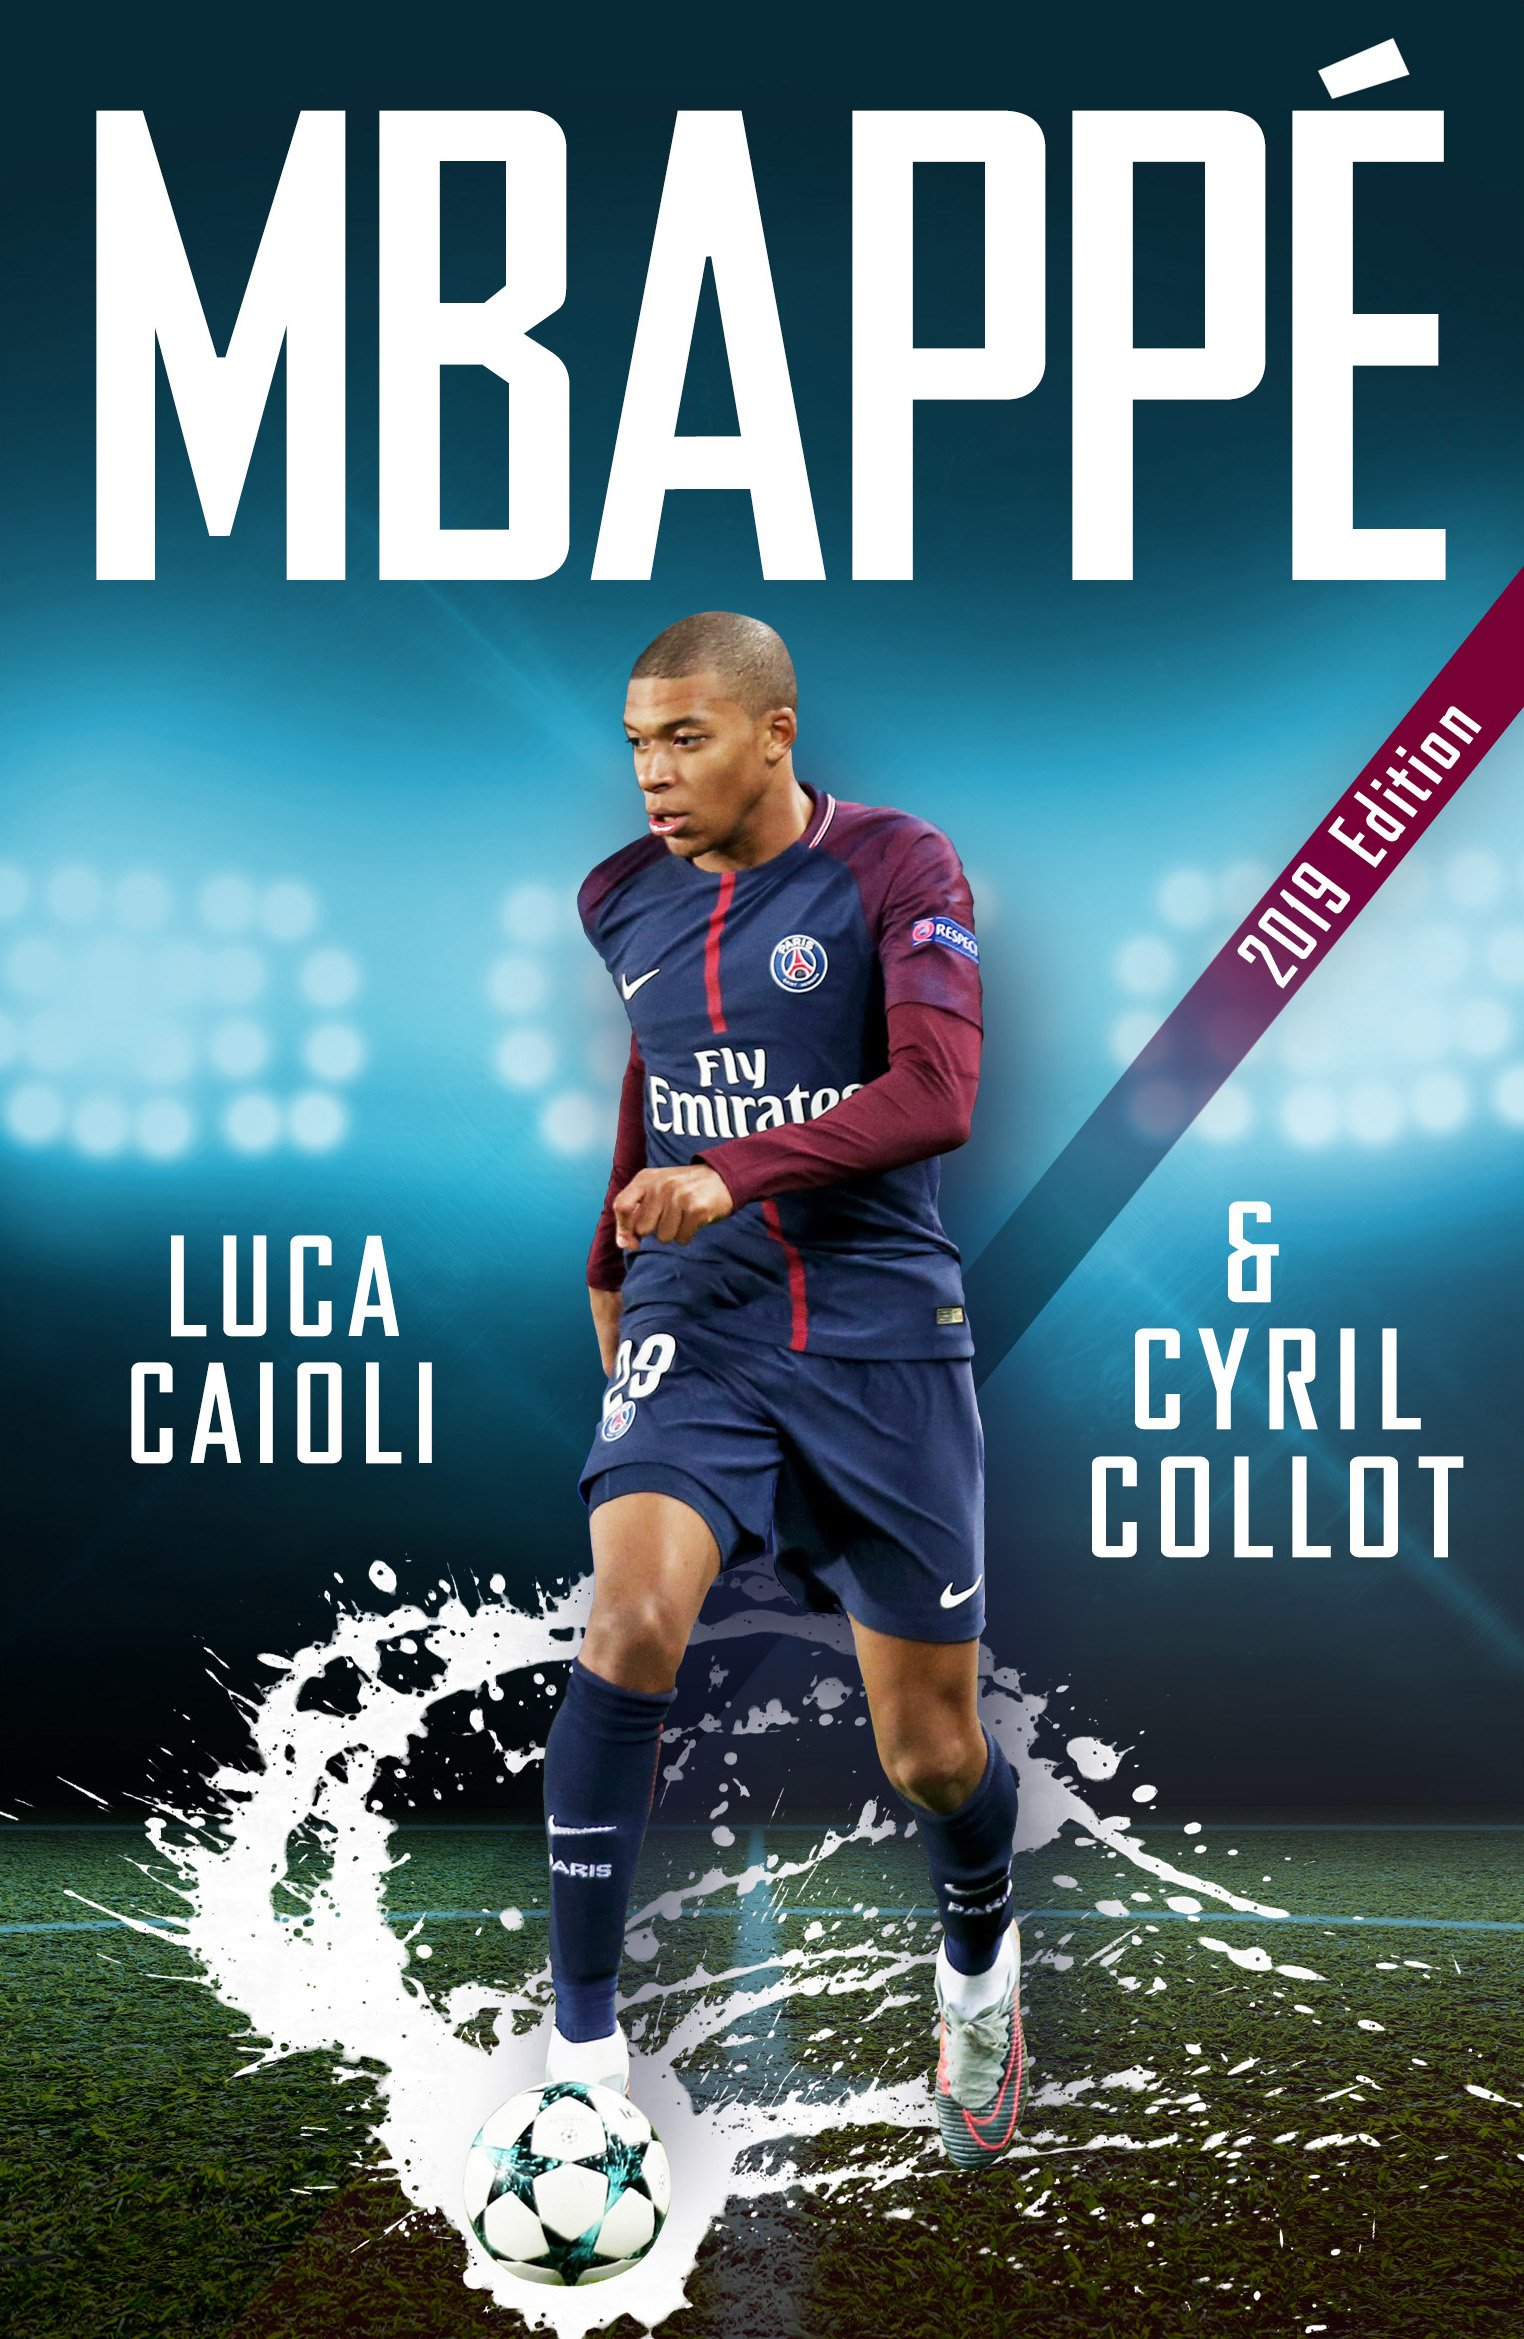 Mbappé: Luca Caioli, Cyril Collot: 9781785784187: Amazon.com: Books